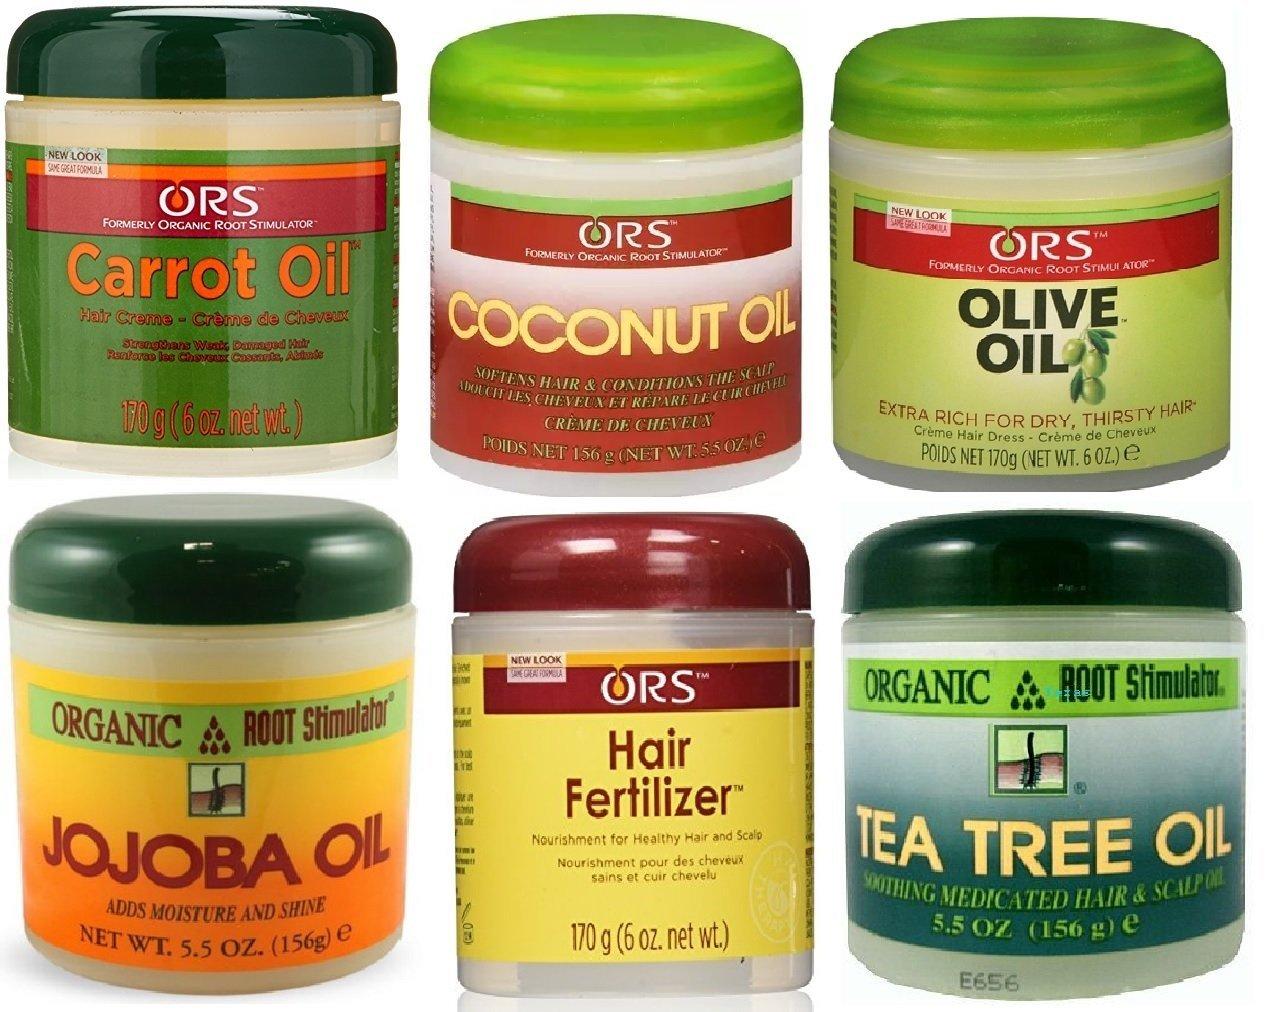 Ors Organic Root Stimulator 6pcs Jar Pomade Set Coconut Oil Olive Jojoba